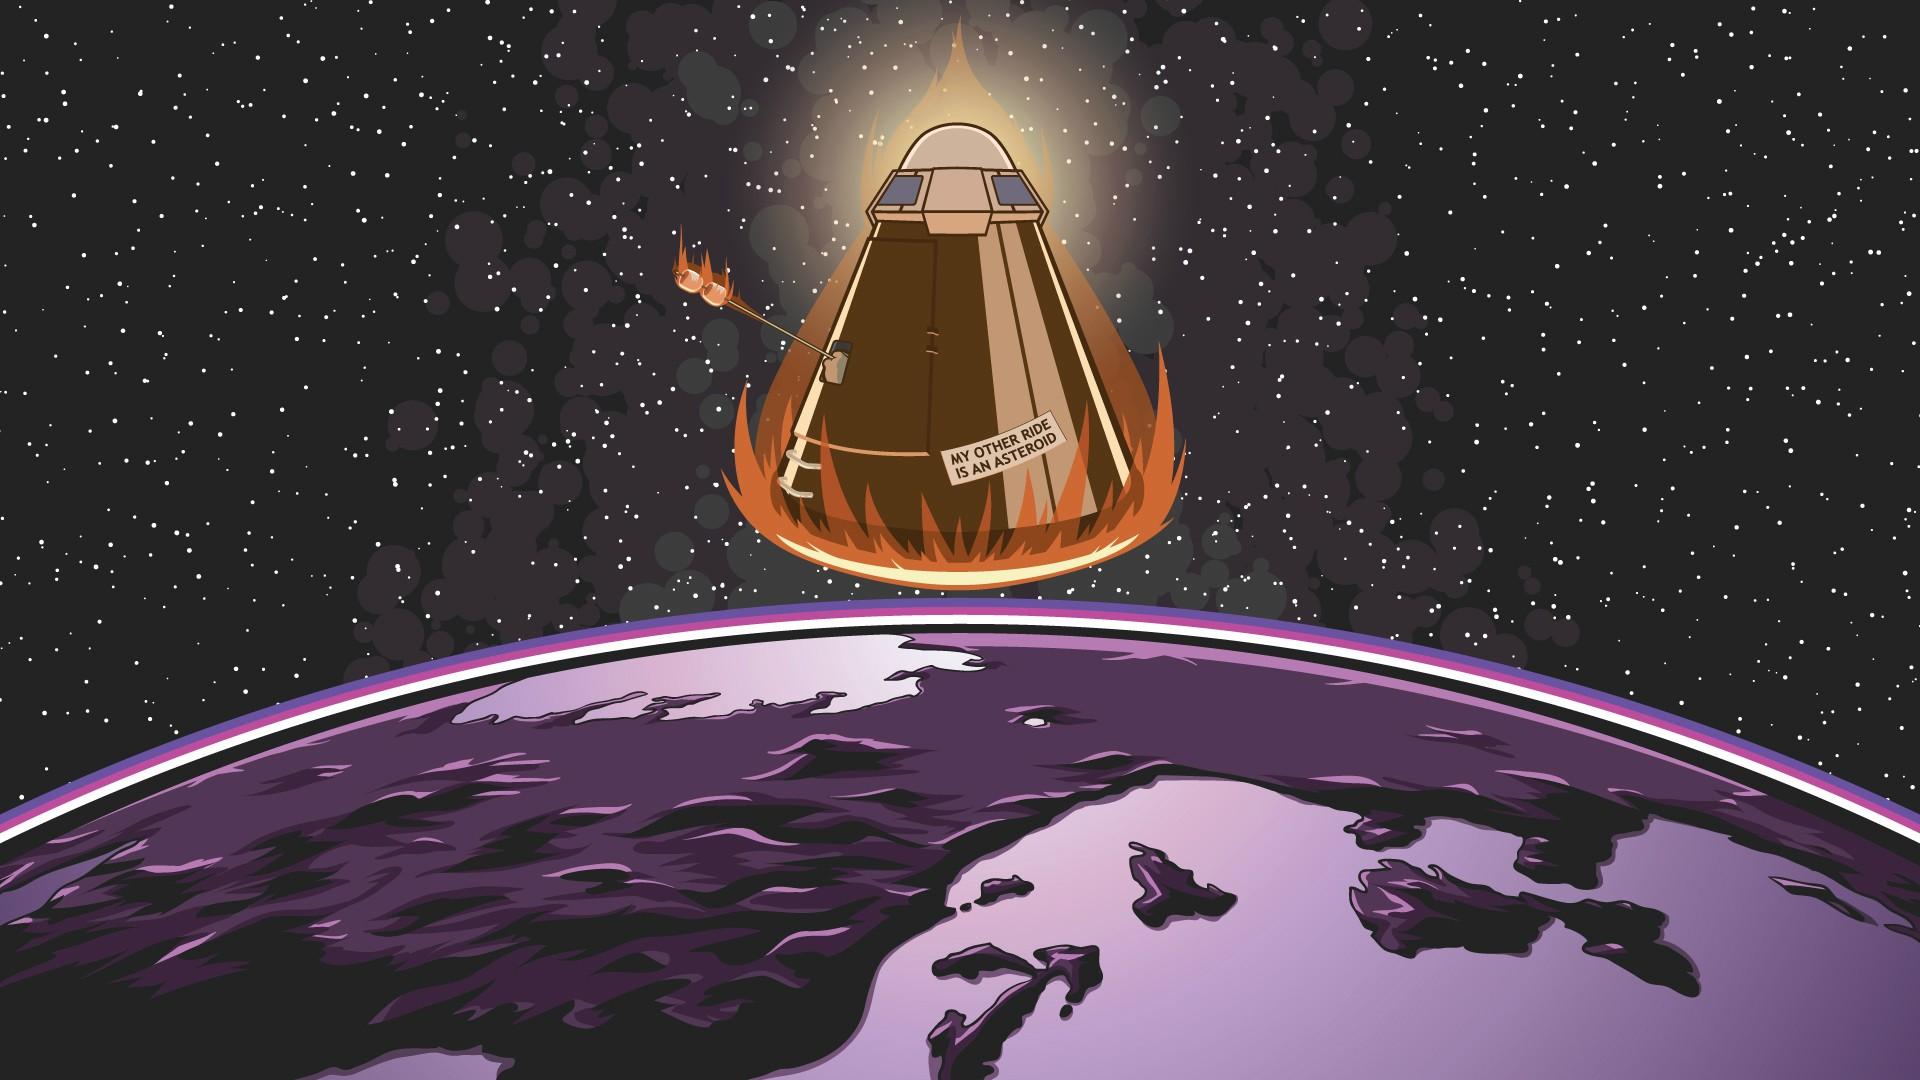 Kamping Trip Kerbal Space Program Artwork 989522 Hd